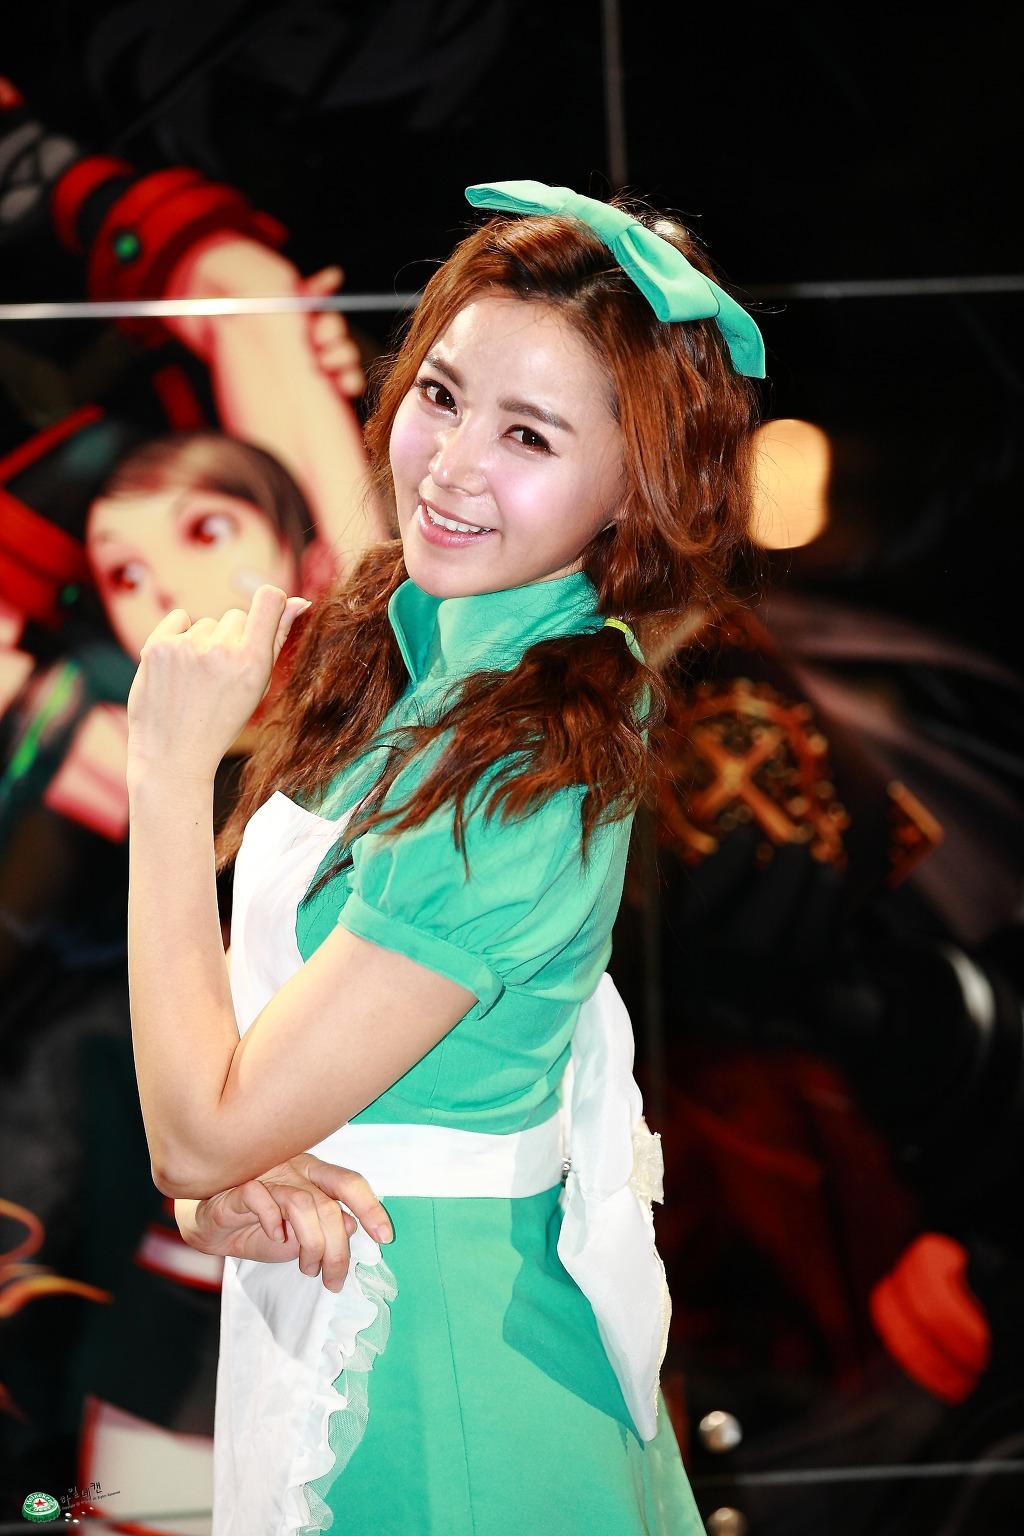 Min Seo Hee at D&F Festival 2012